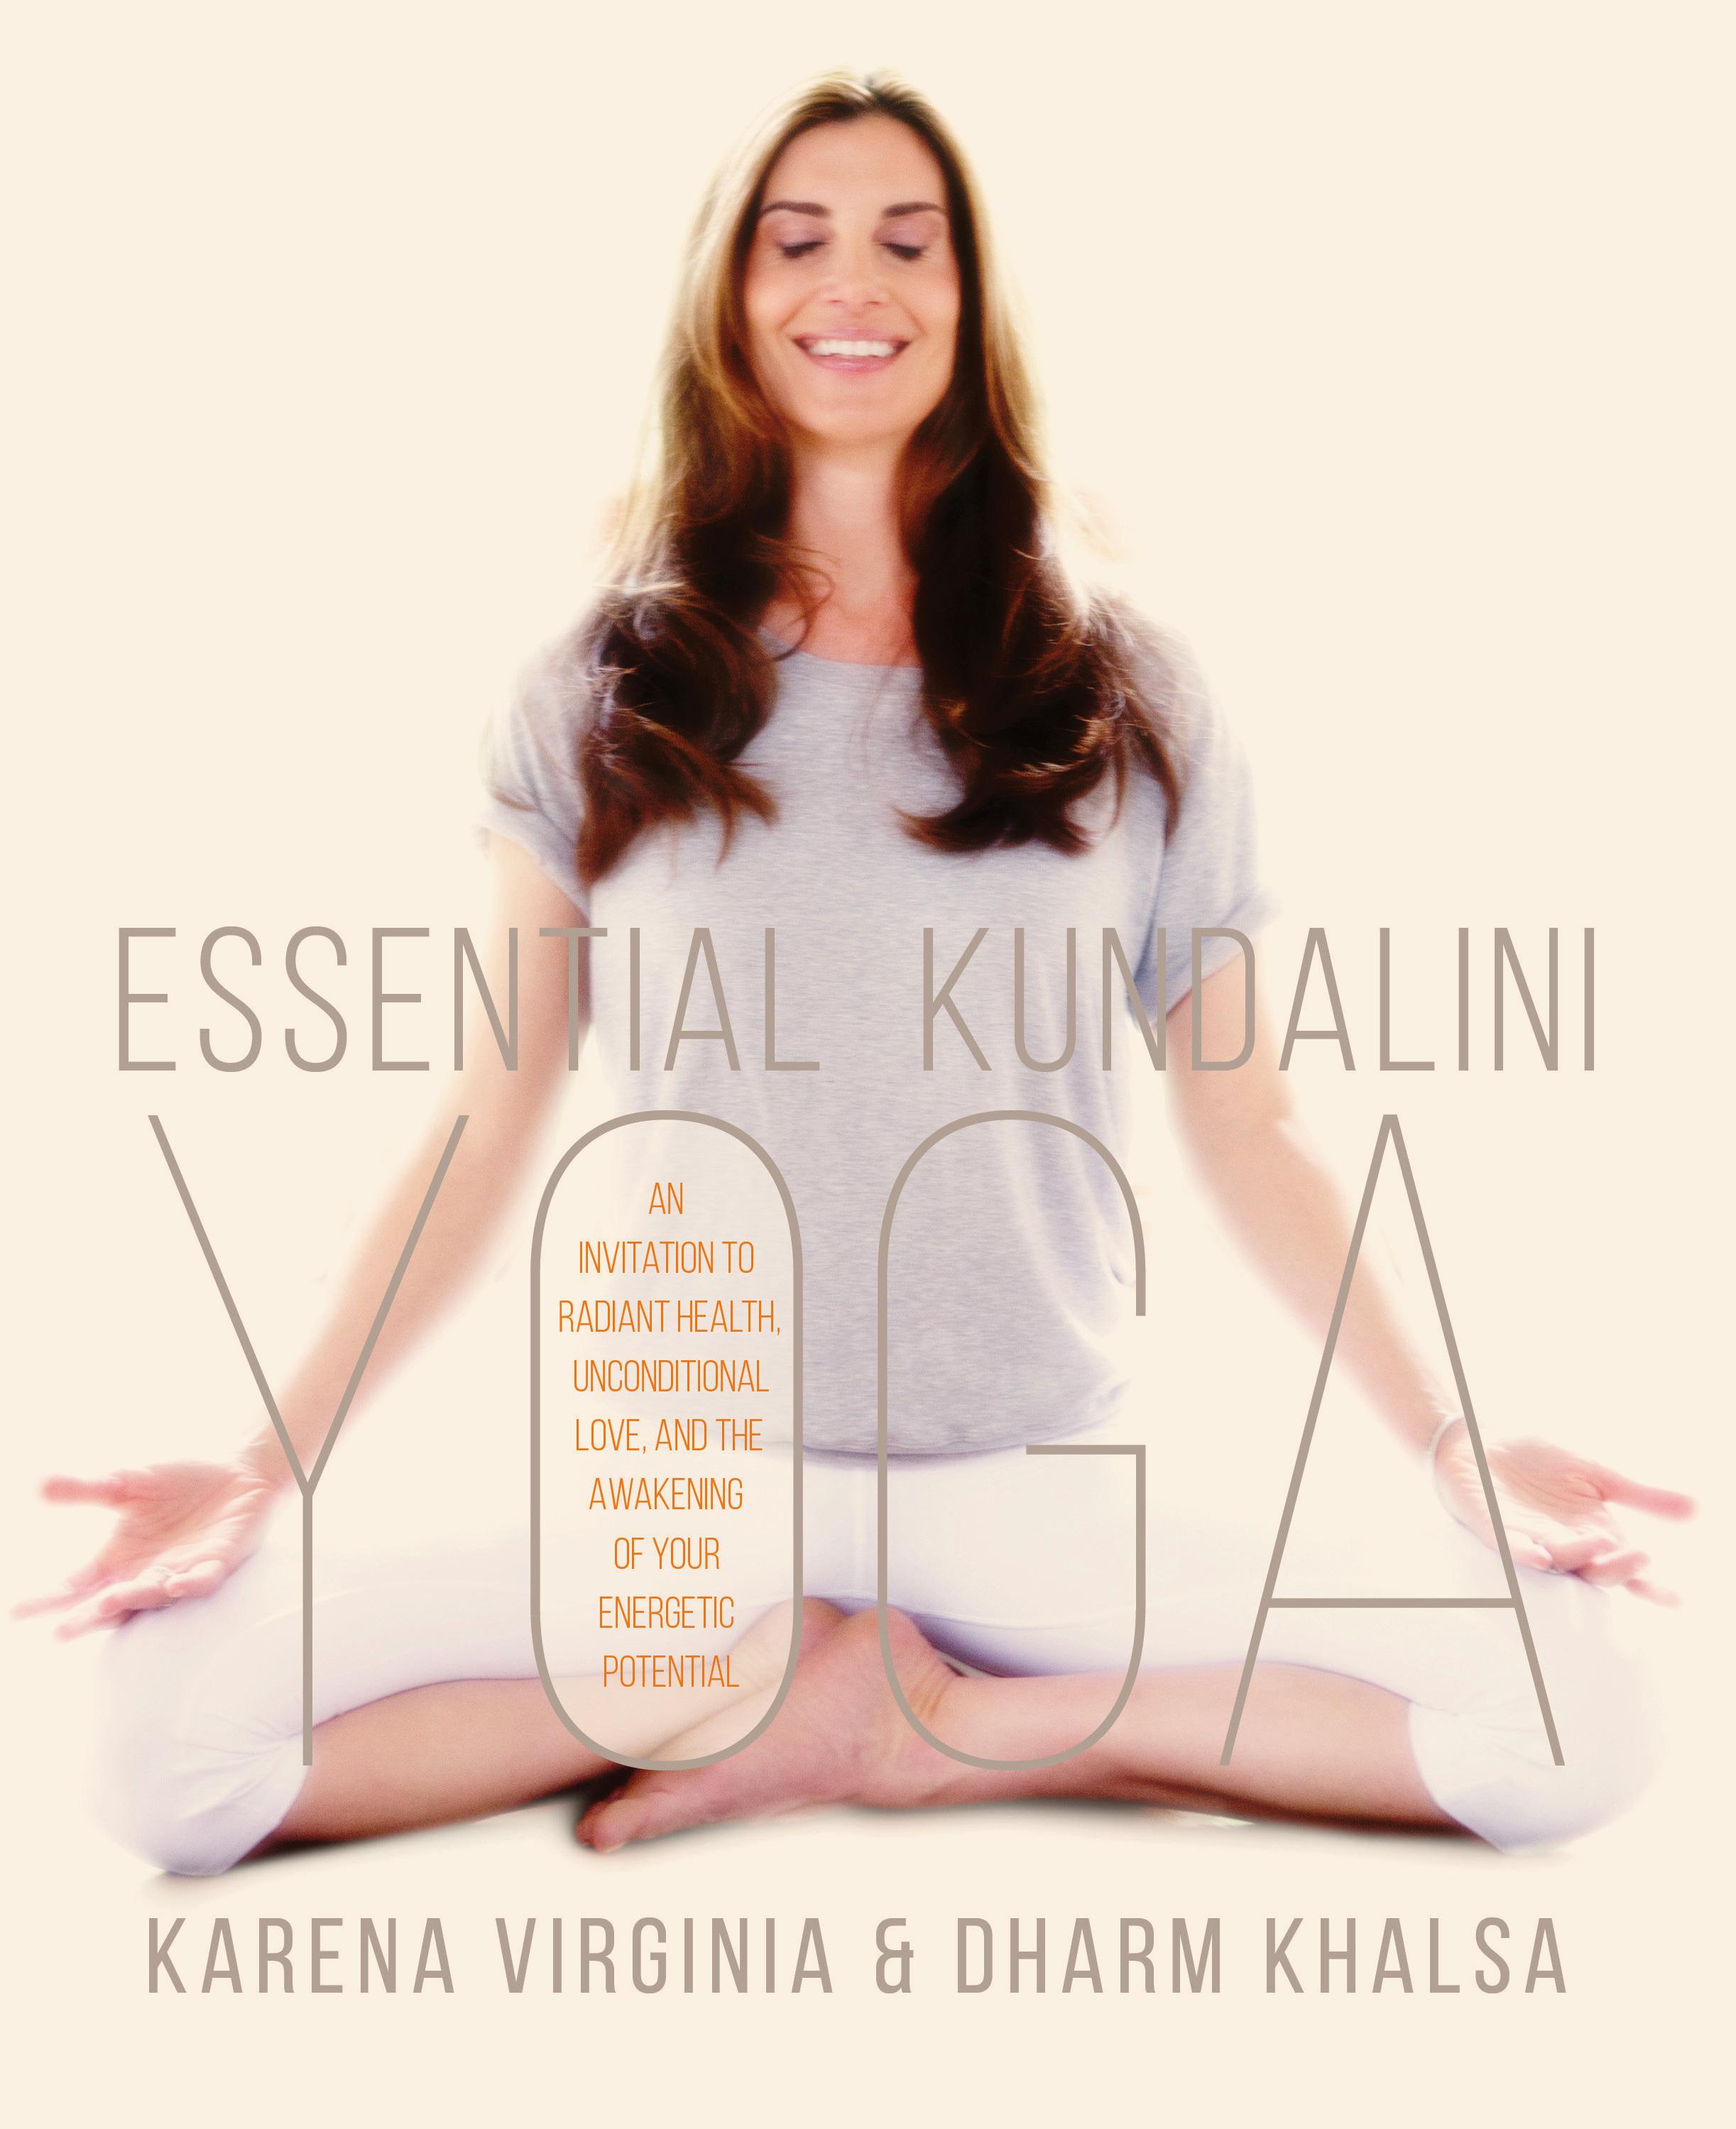 bk04748-essential-kundalini-yoga-published-cover_1.jpg